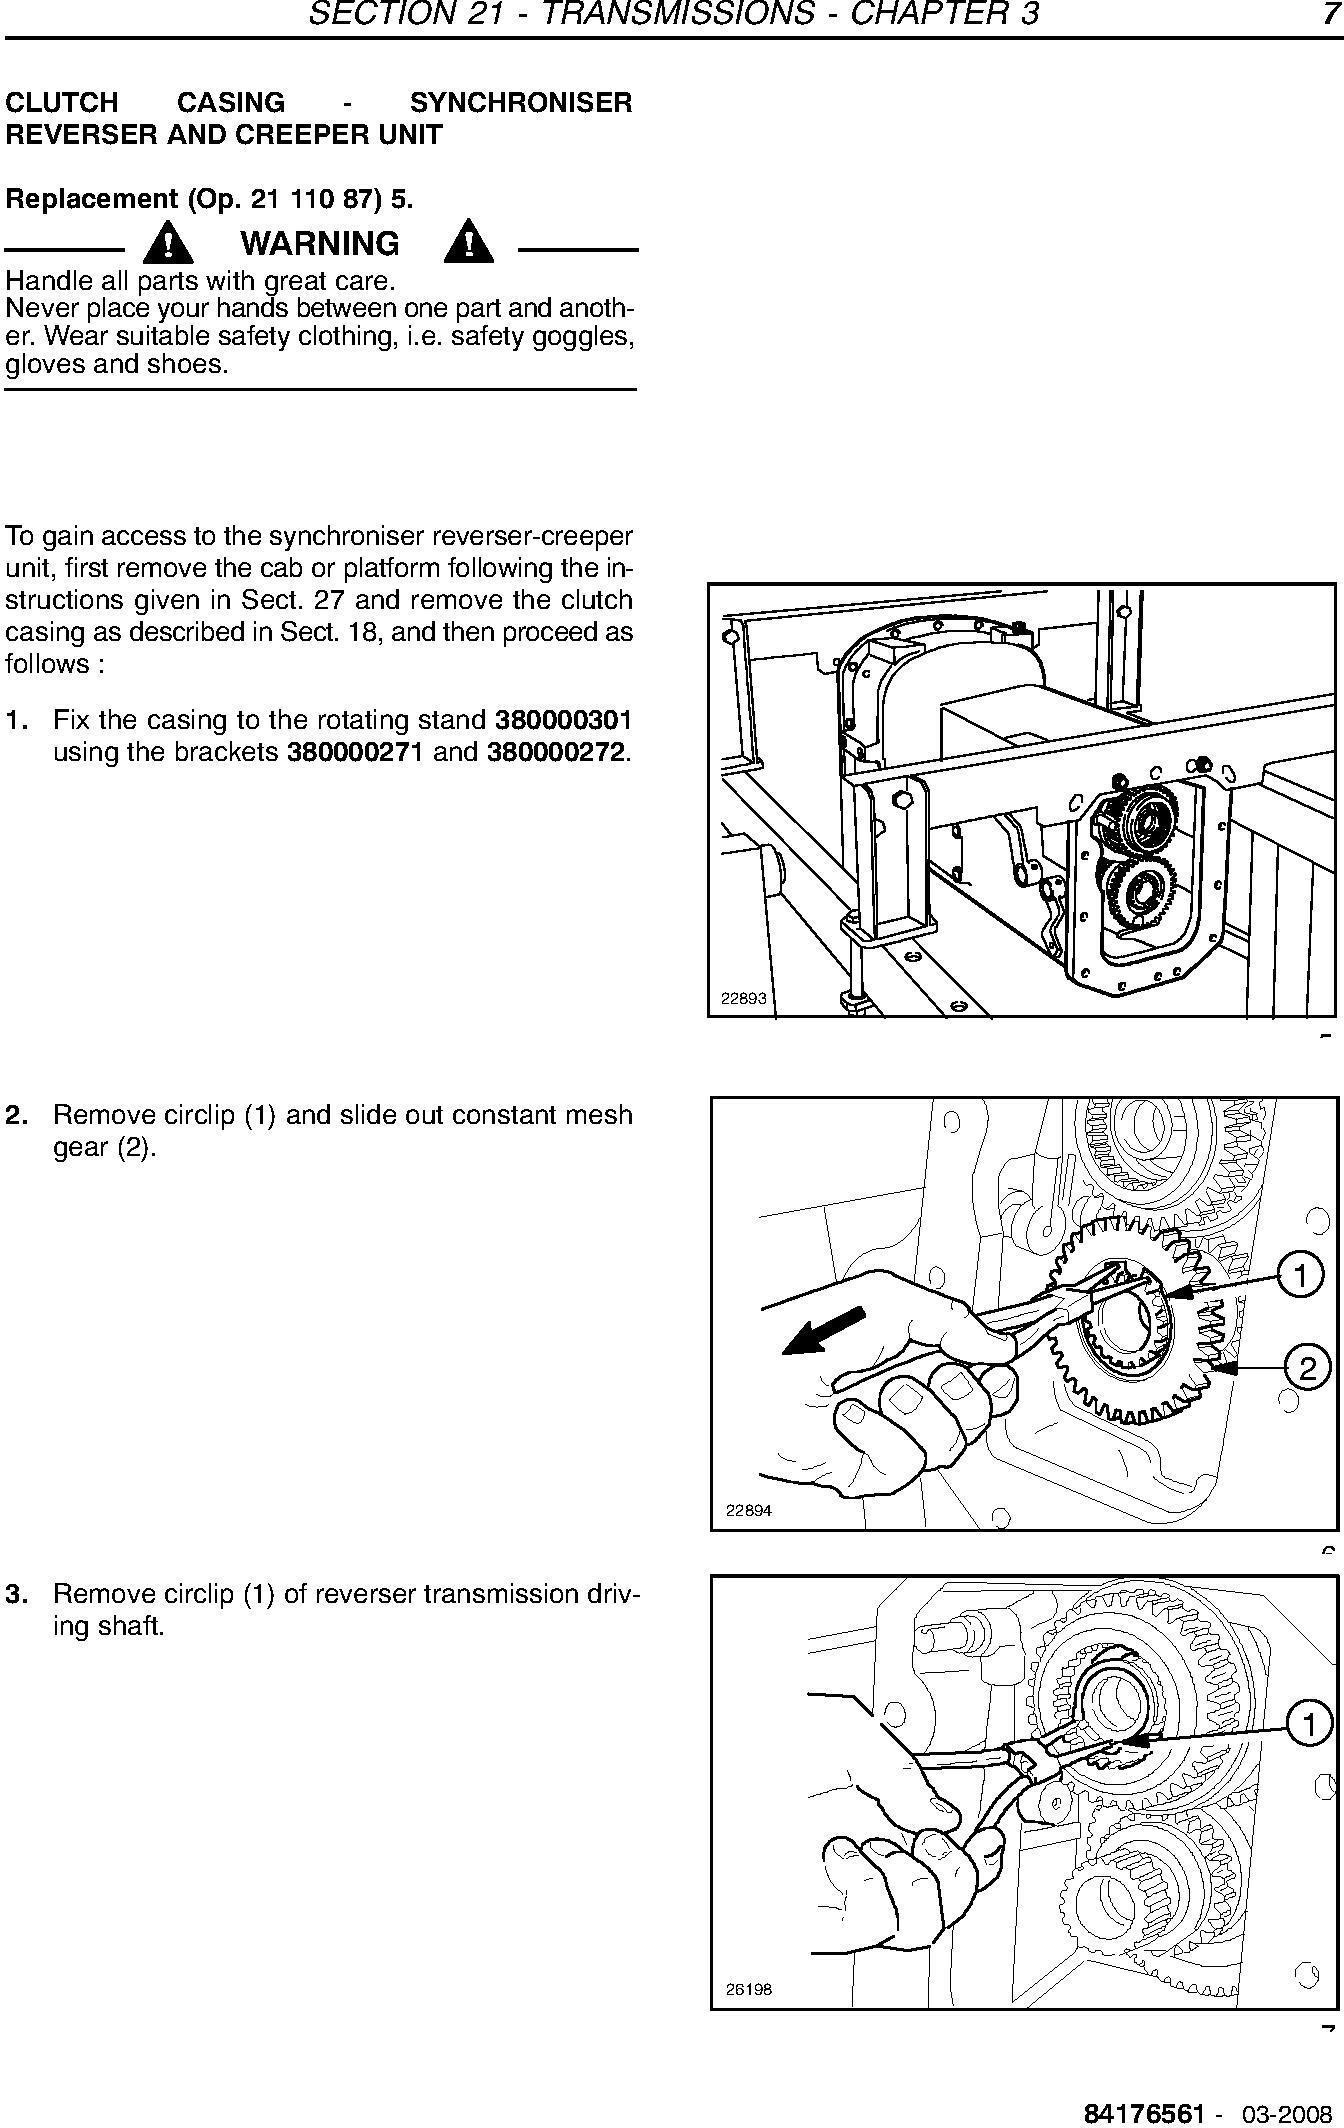 New Holland TD5010/TD5020/TD5030/TD5040/TD5050 Tractors Agricultural Service Manual - 2